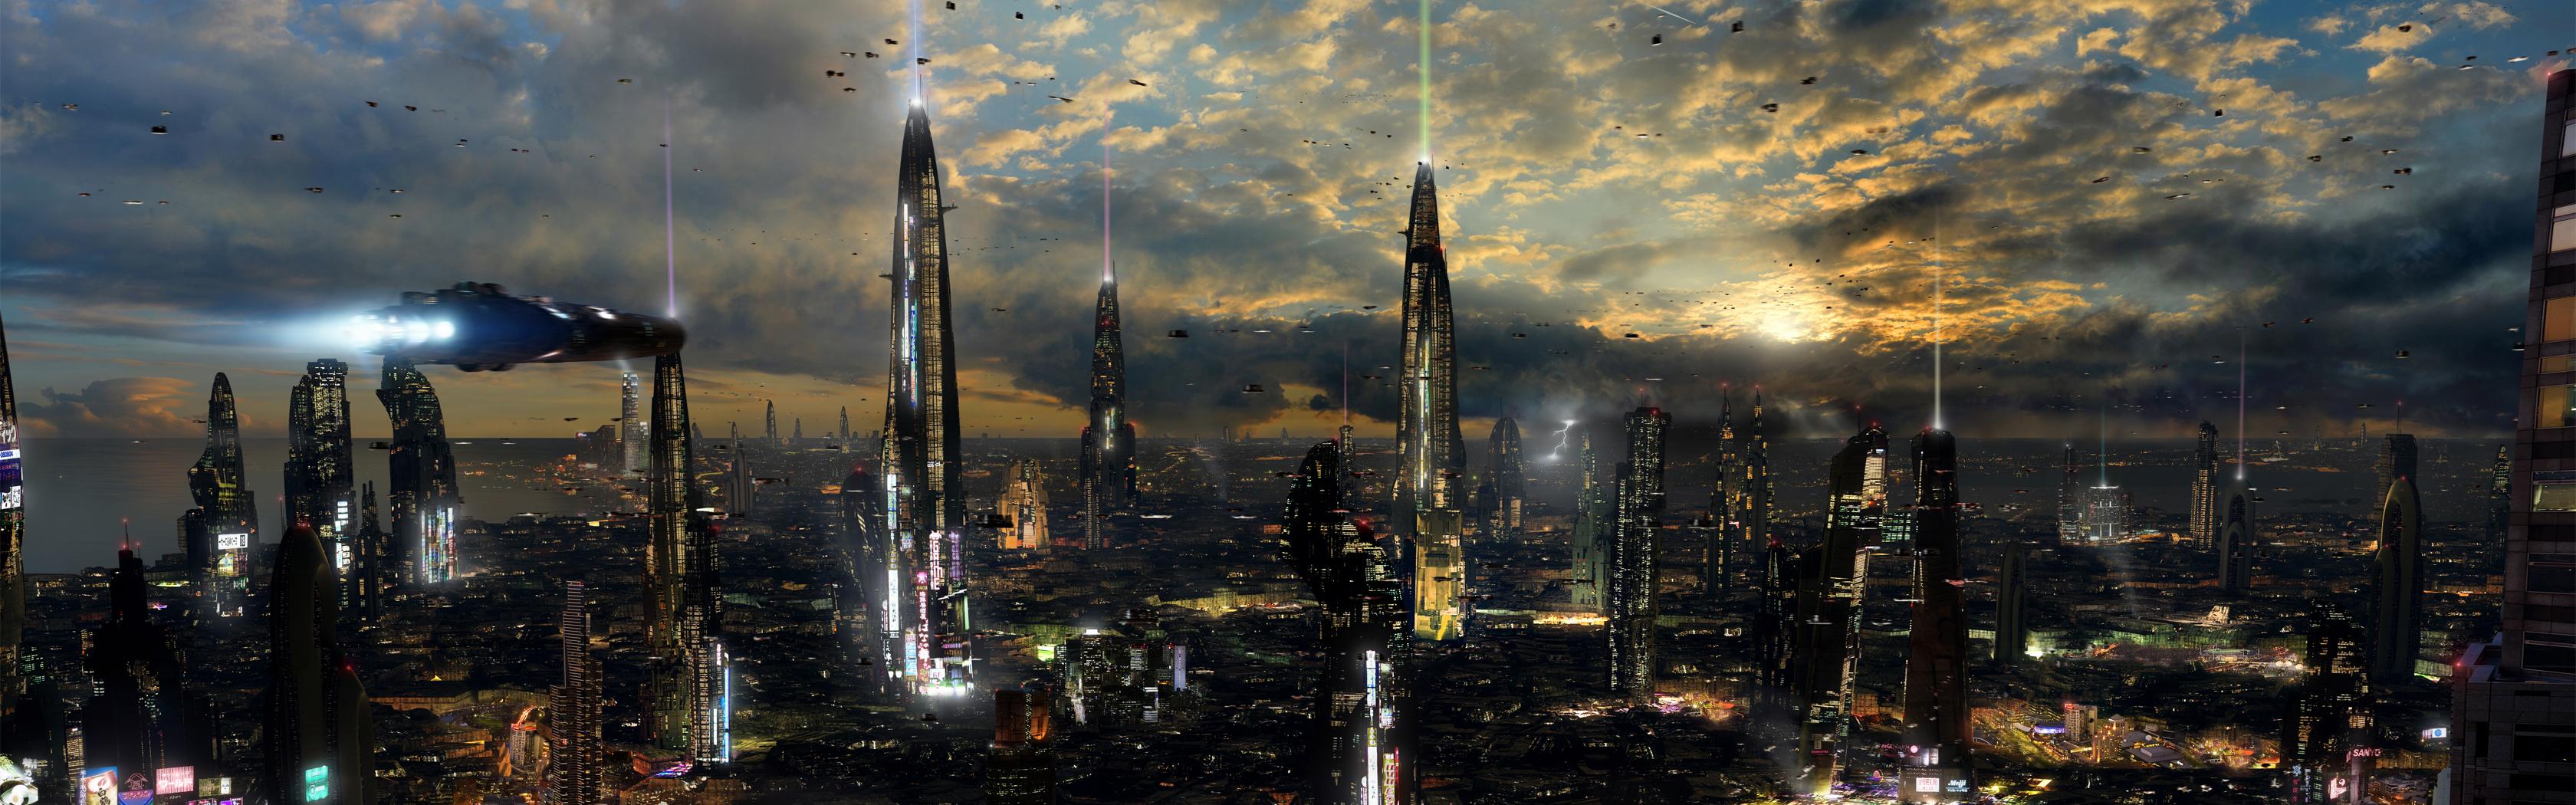 Futuristic City 4 Dual Desktop by rich35211